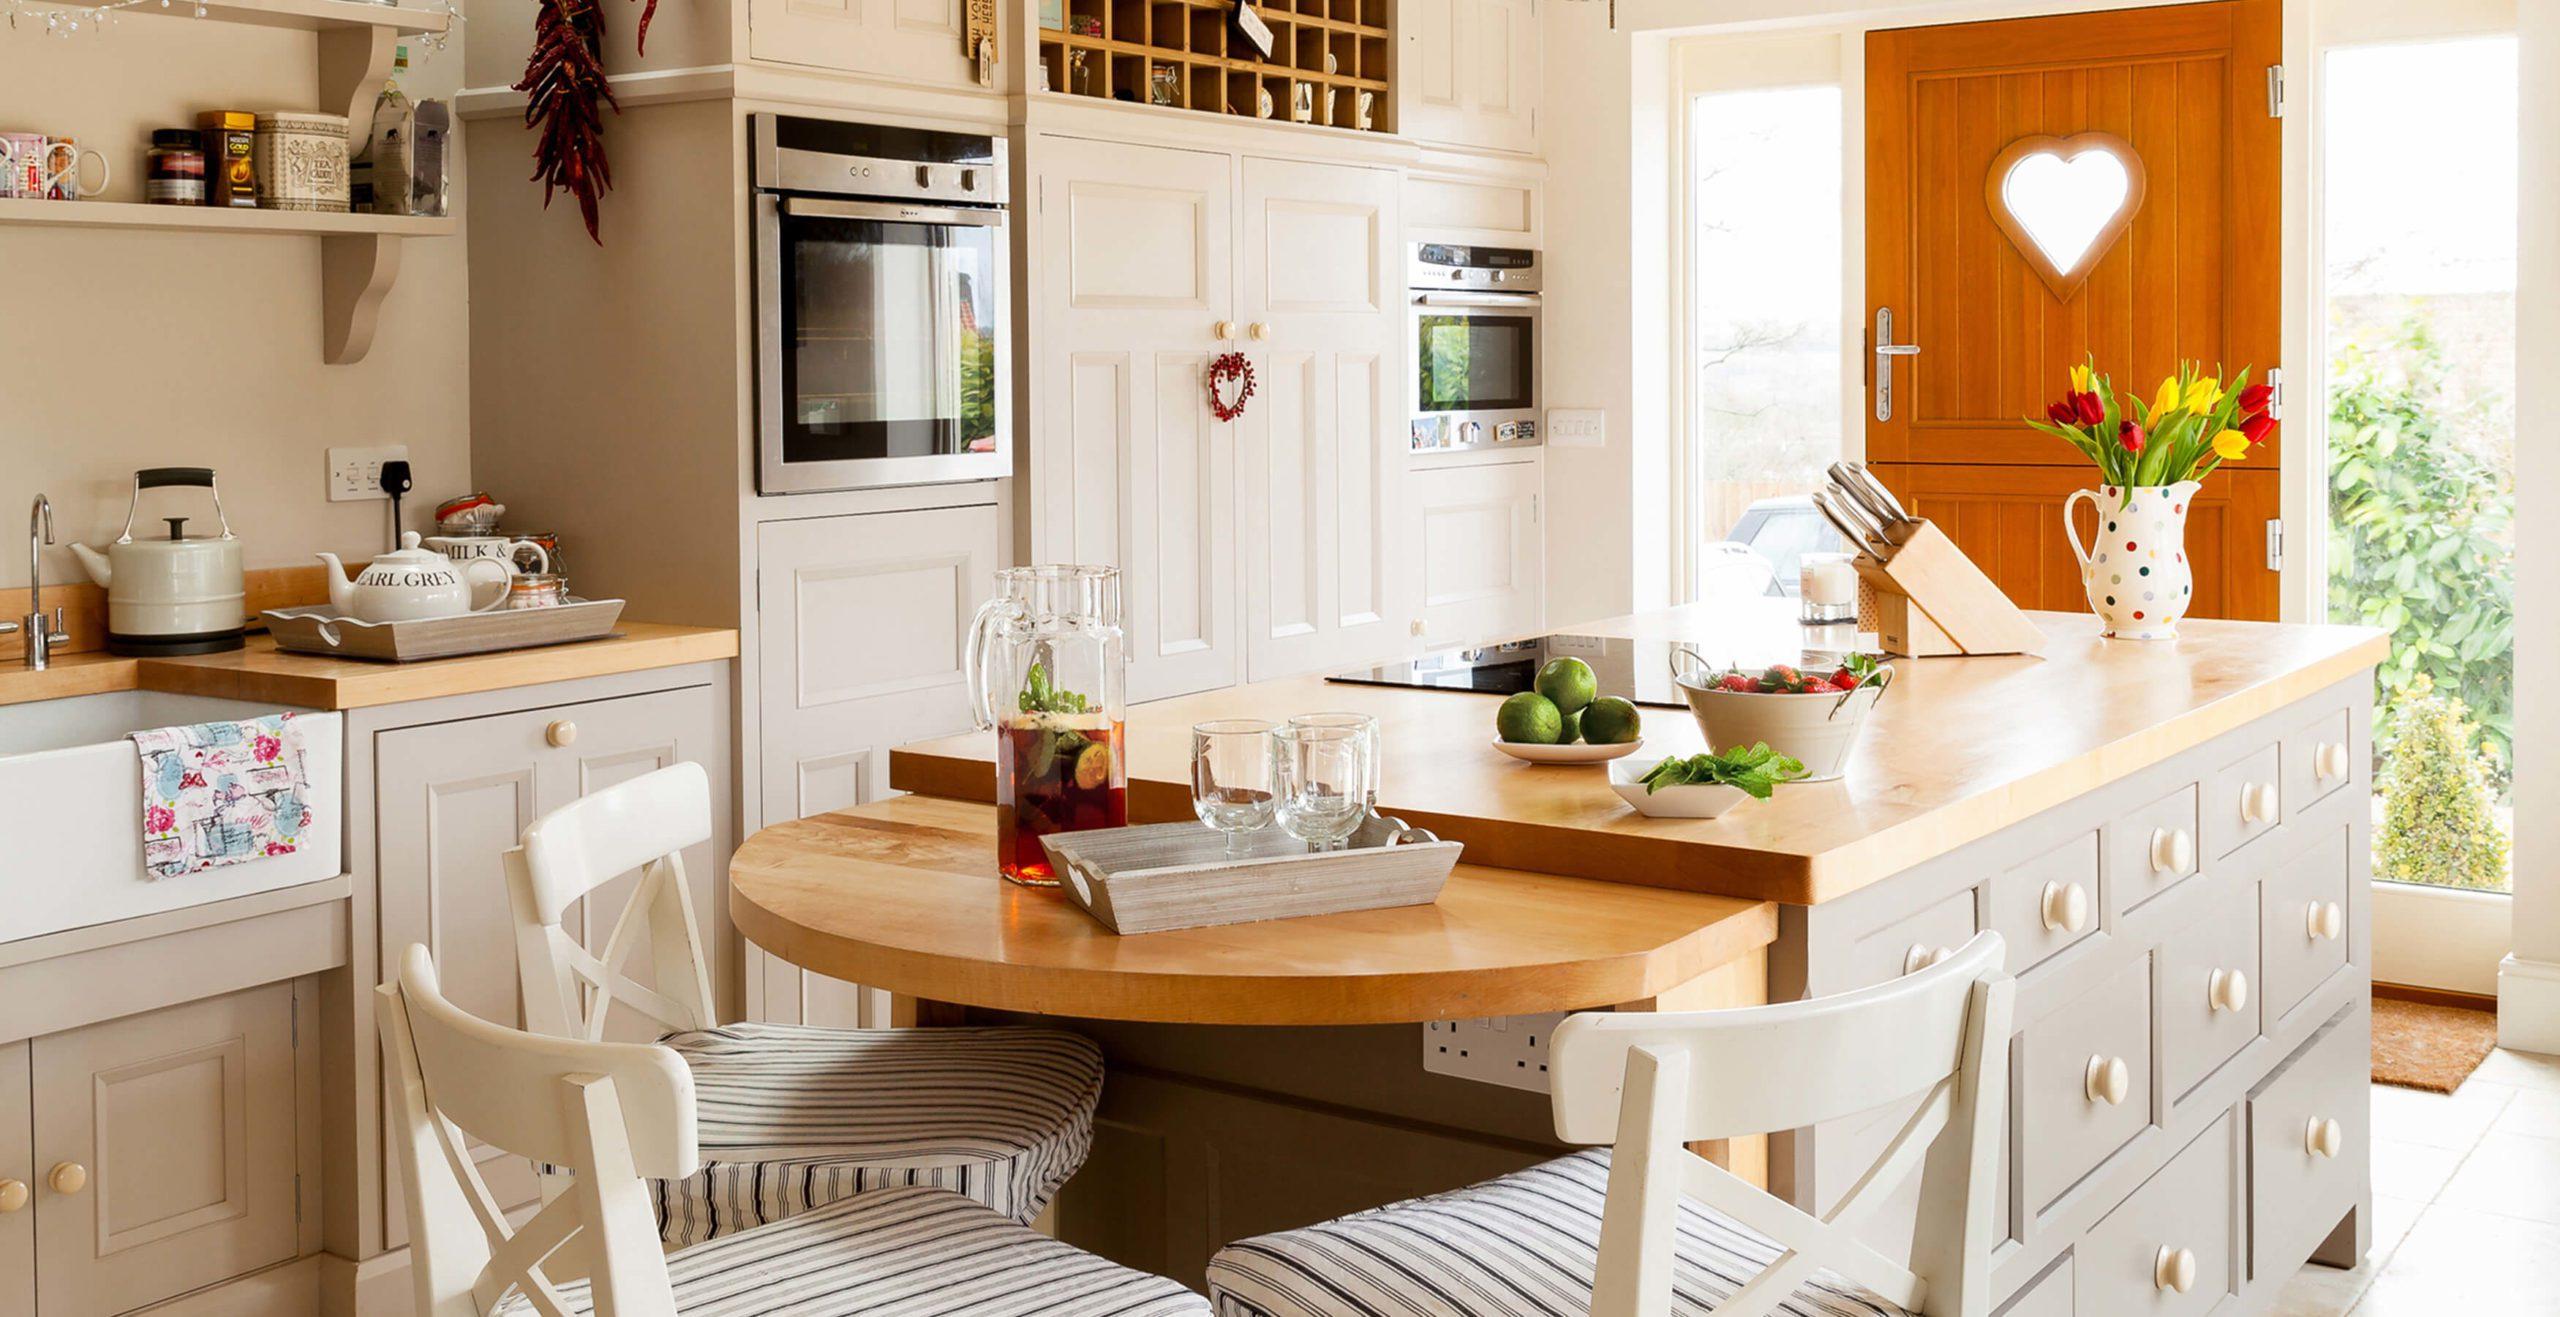 Rutland Kitchen - Hill Farm Furniture